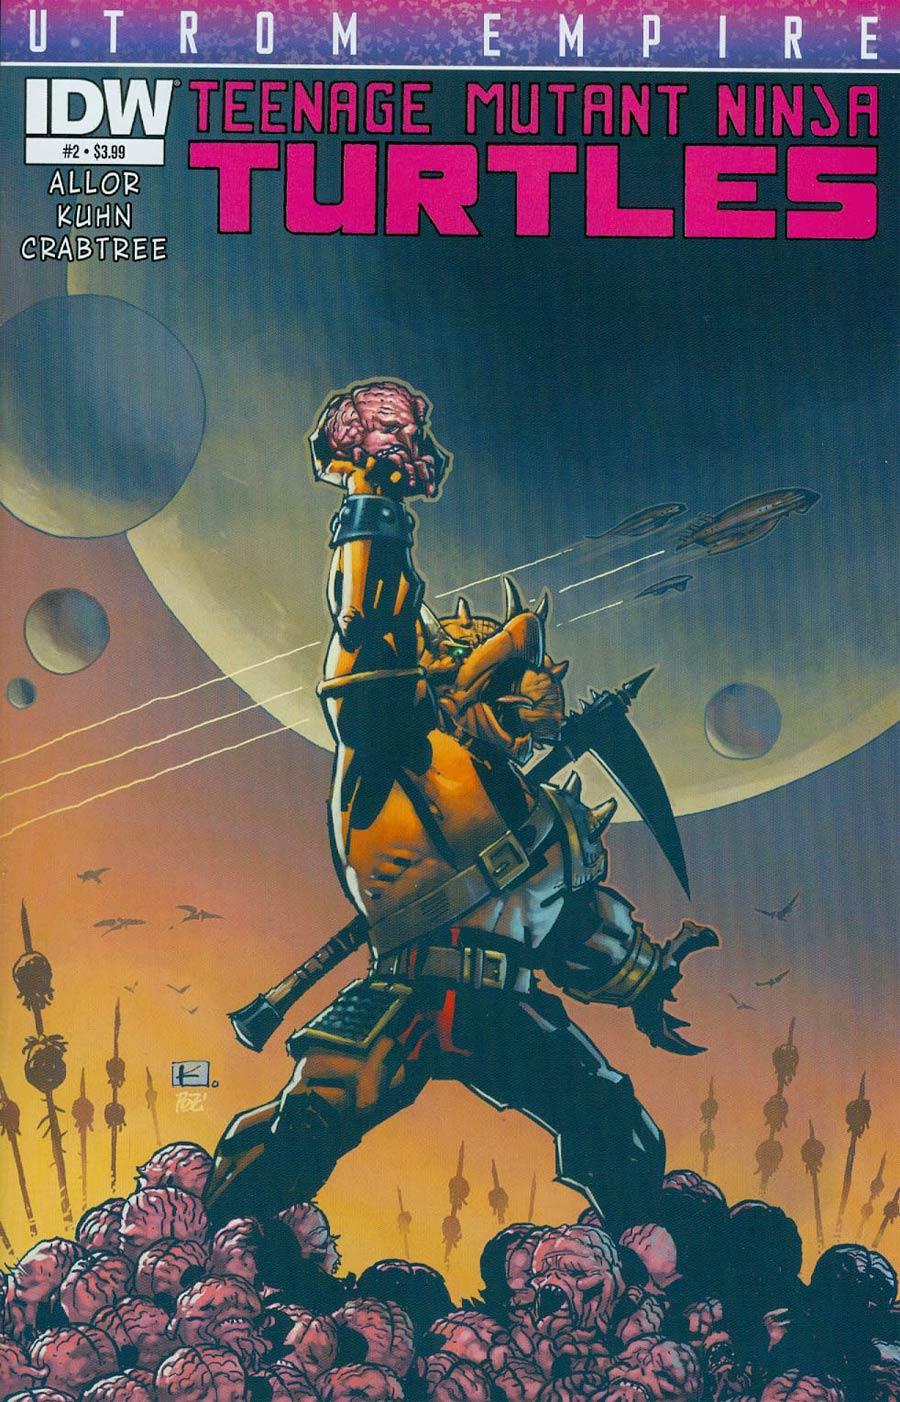 Teenage Mutant Ninja Turtles Utrom Empire #2 Cover A Regular Andy Kuhn Cover